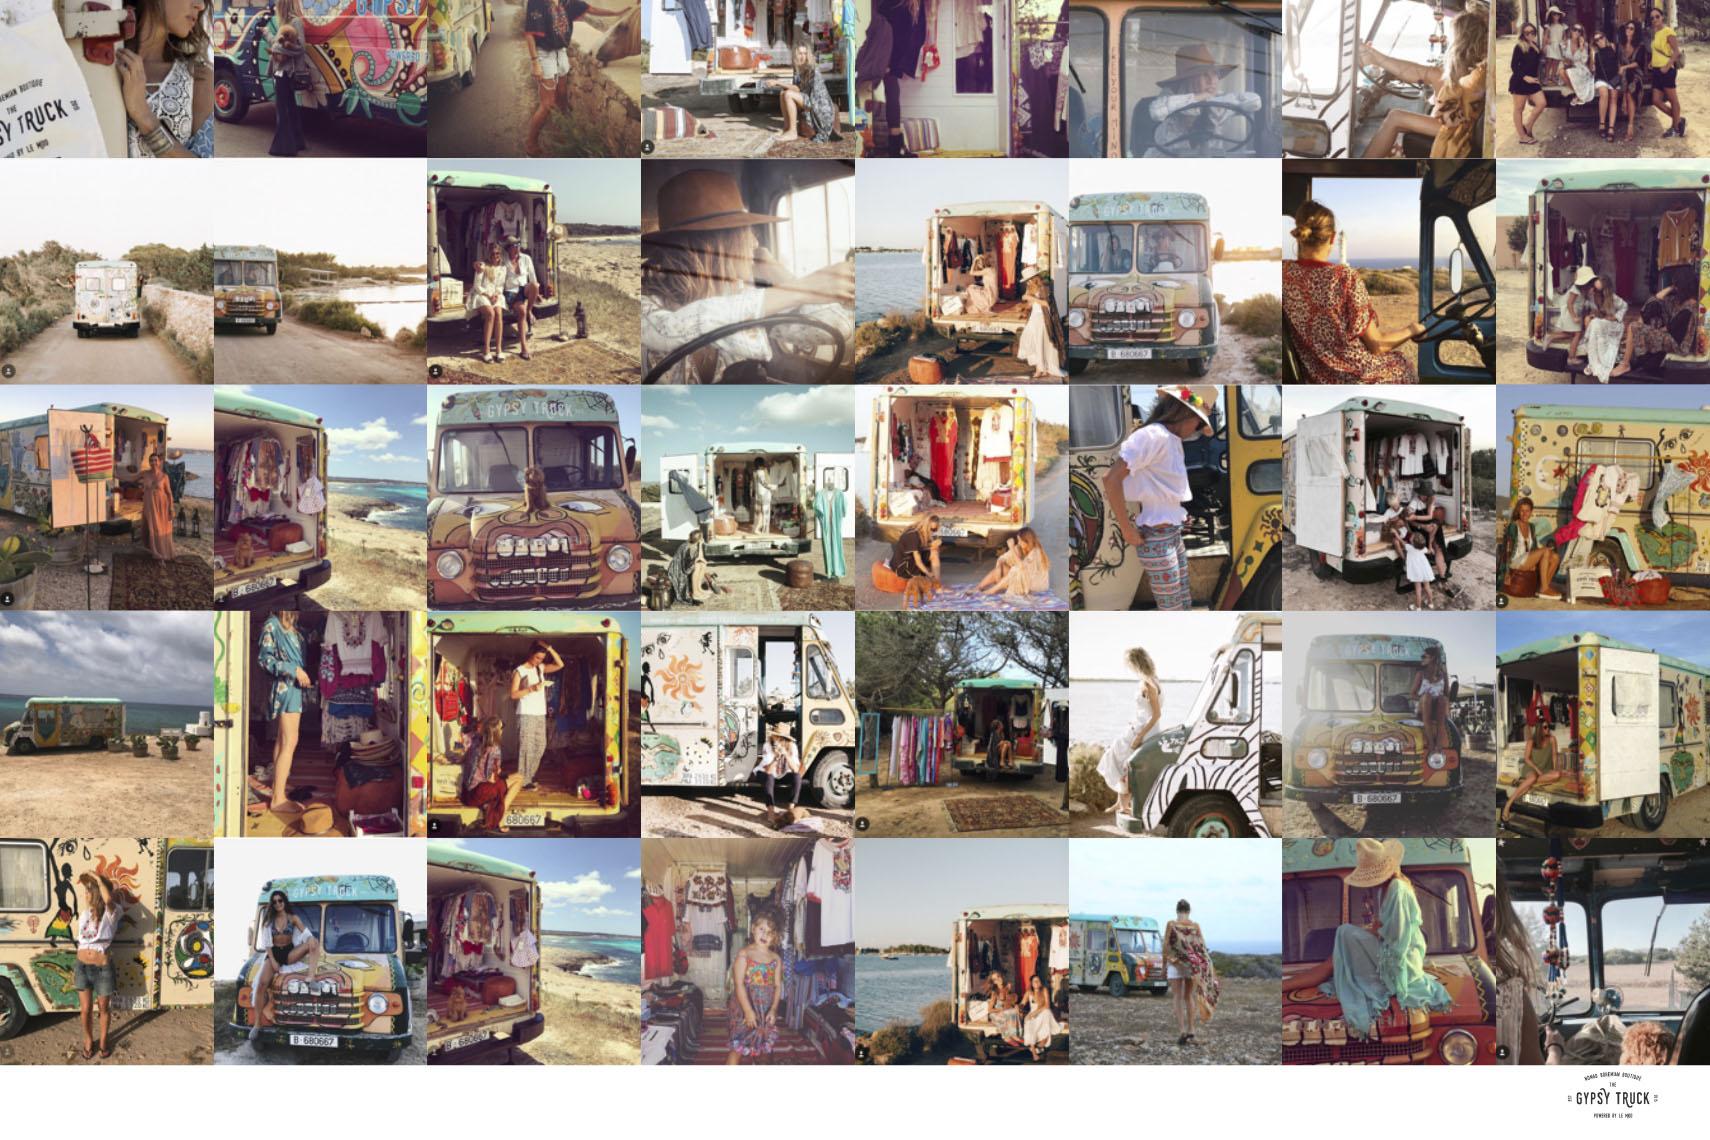 gypsy-truck-moda-malaga-marbella-sotogrande